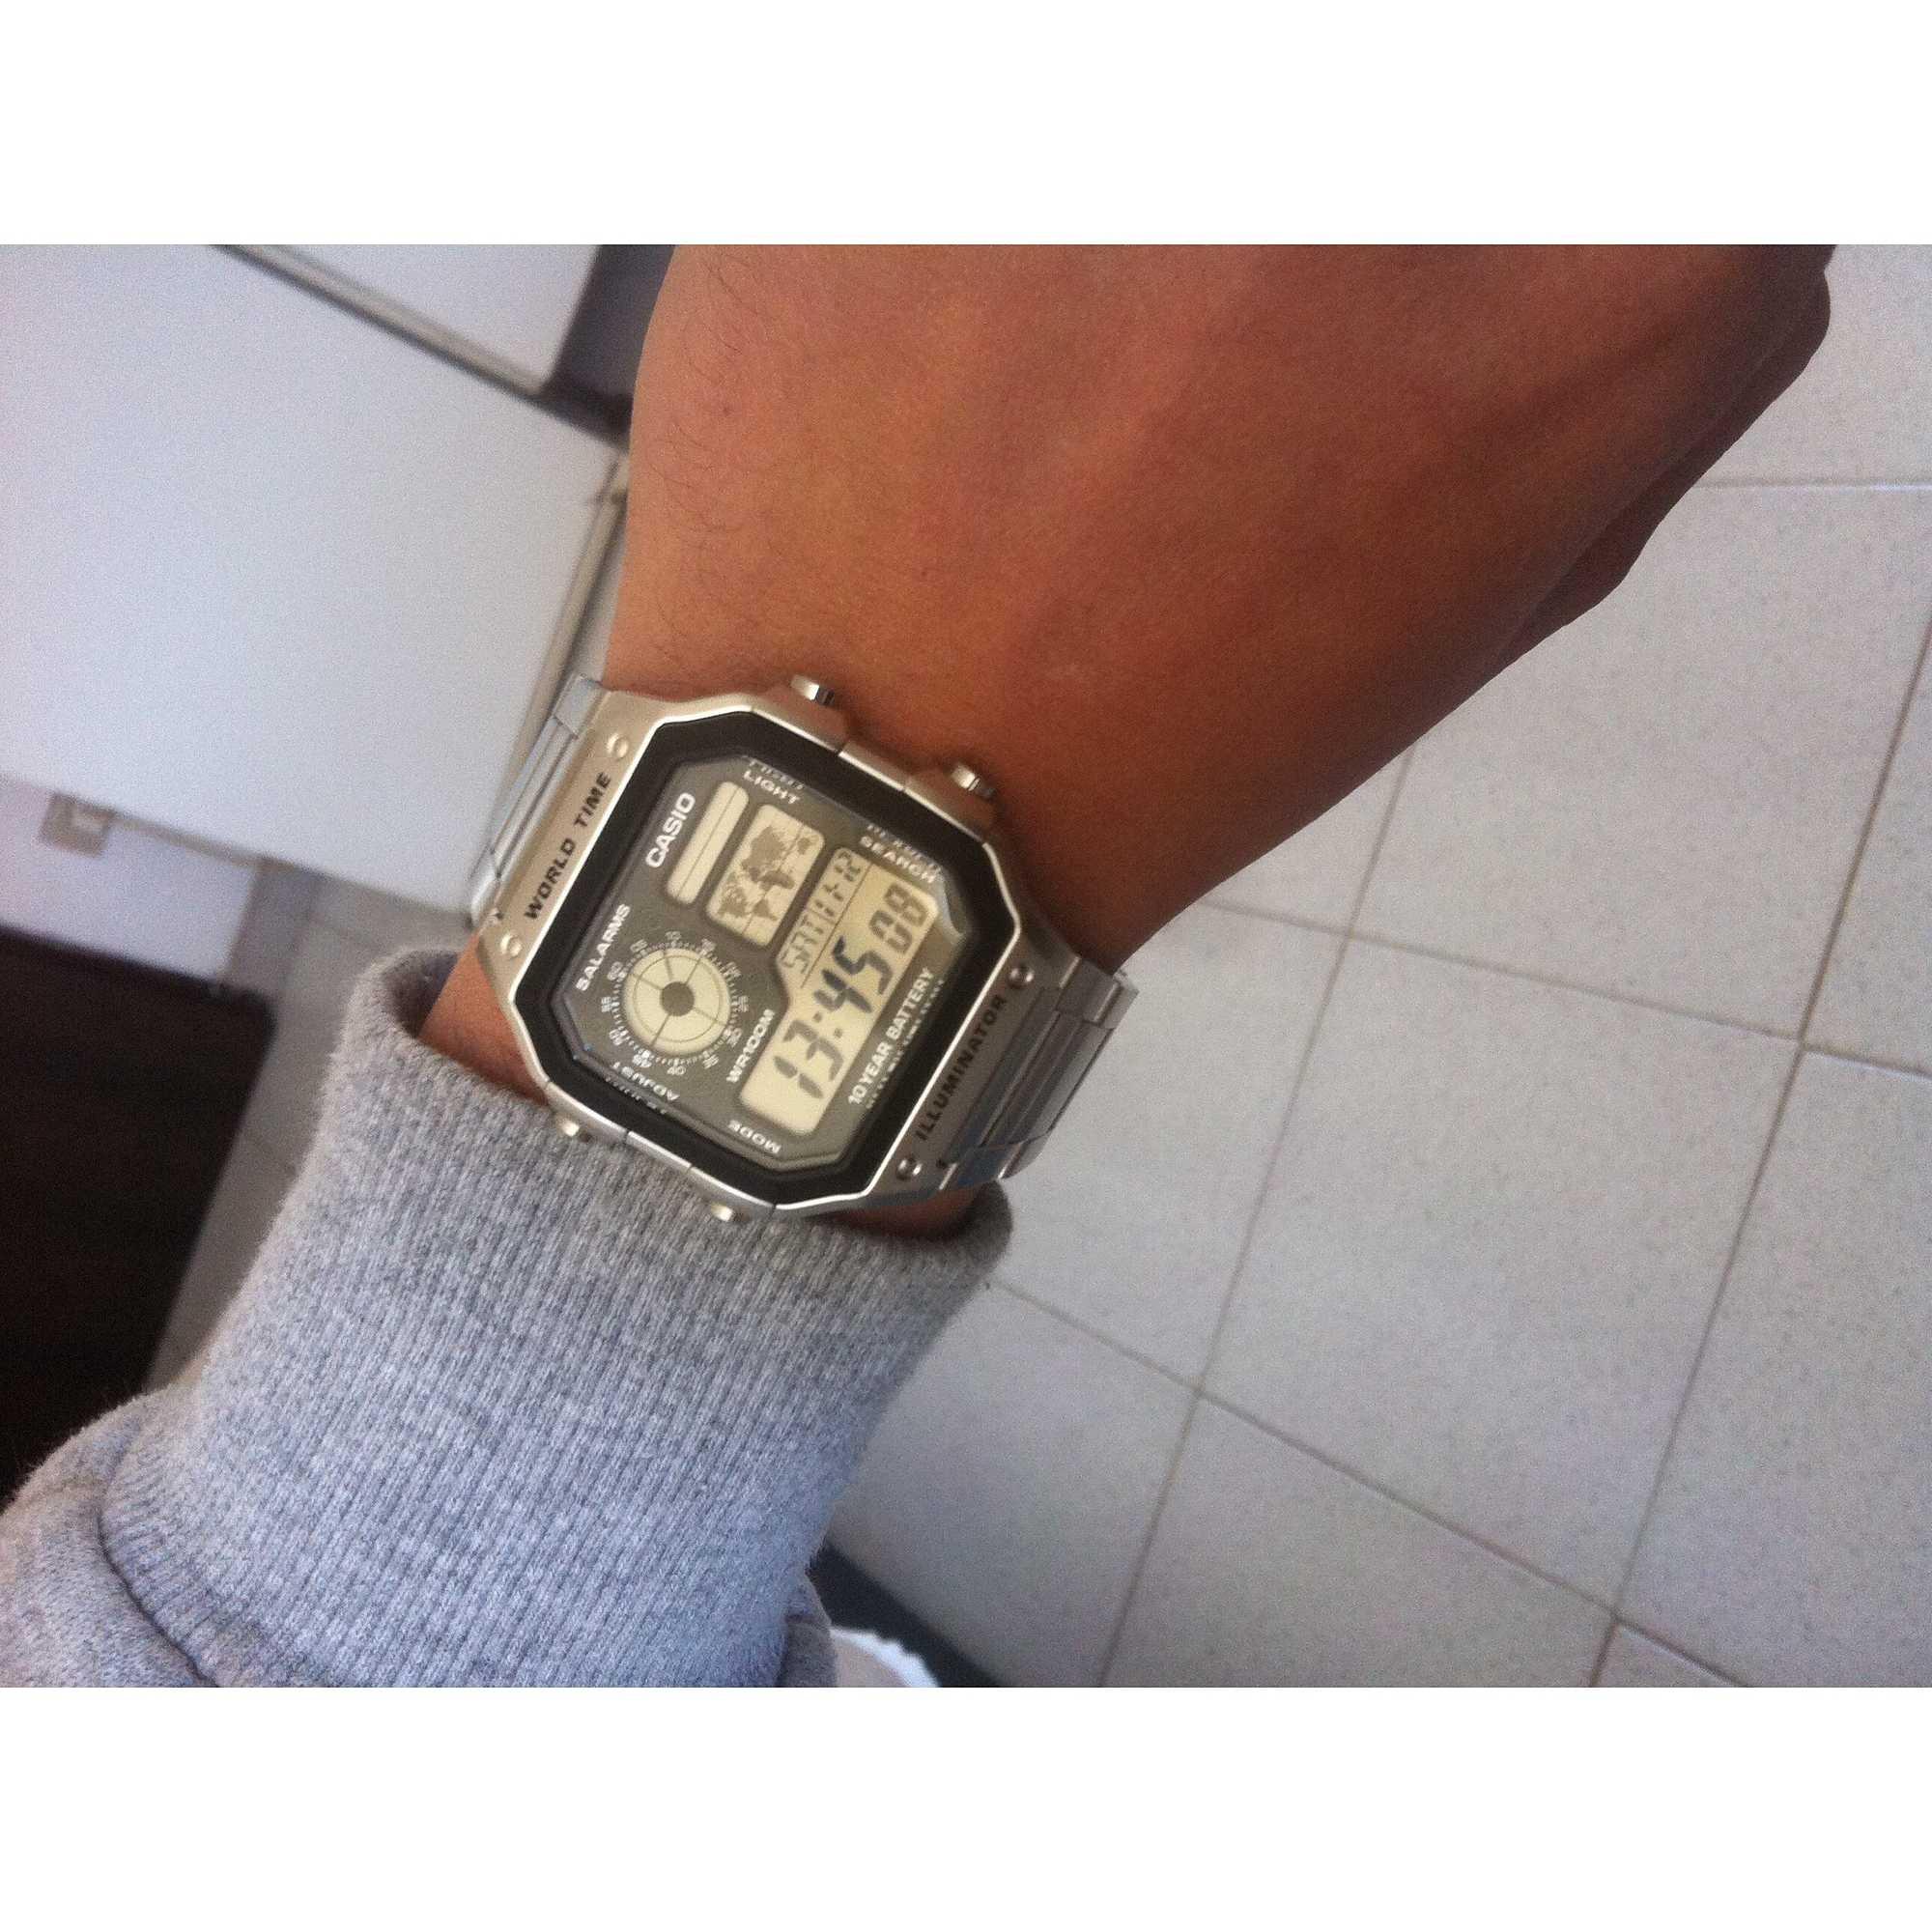 Watch Digital Man Casio Collection Ae 1200whd 1avef Digitals World Time 1a Original Prev